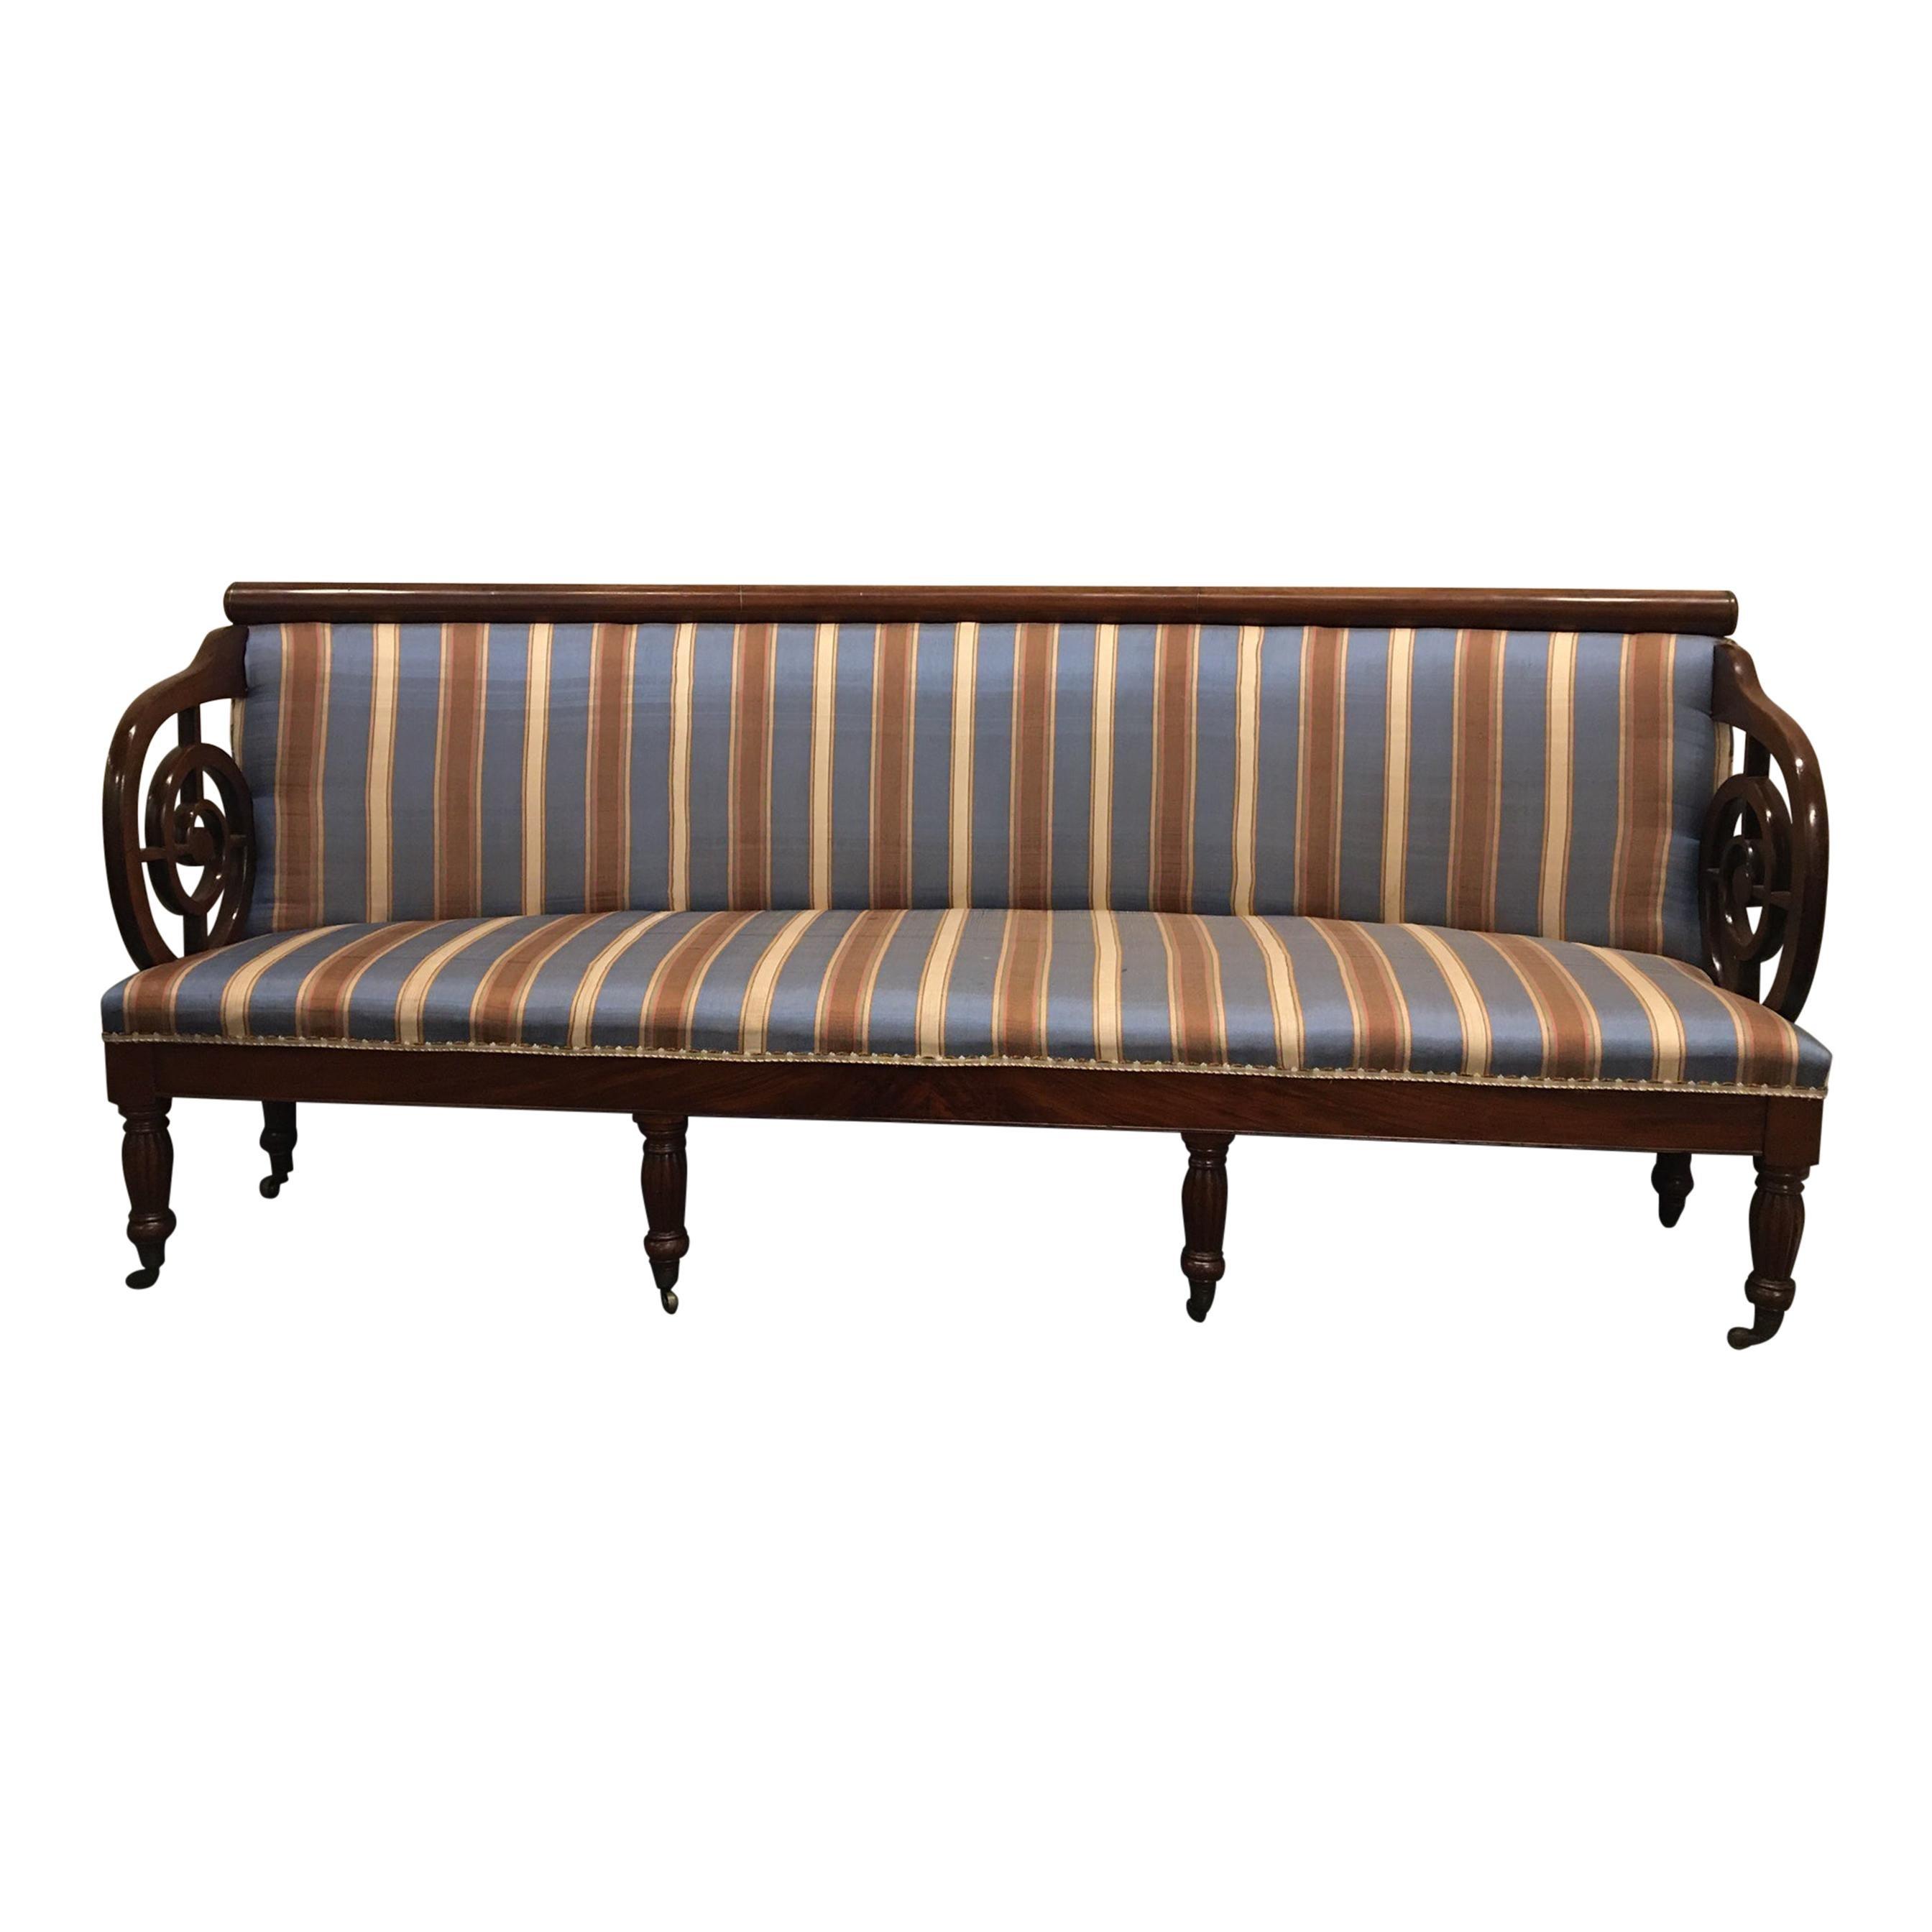 Upholstered Charles X Mahogany Sofa on Casters, 19th Century